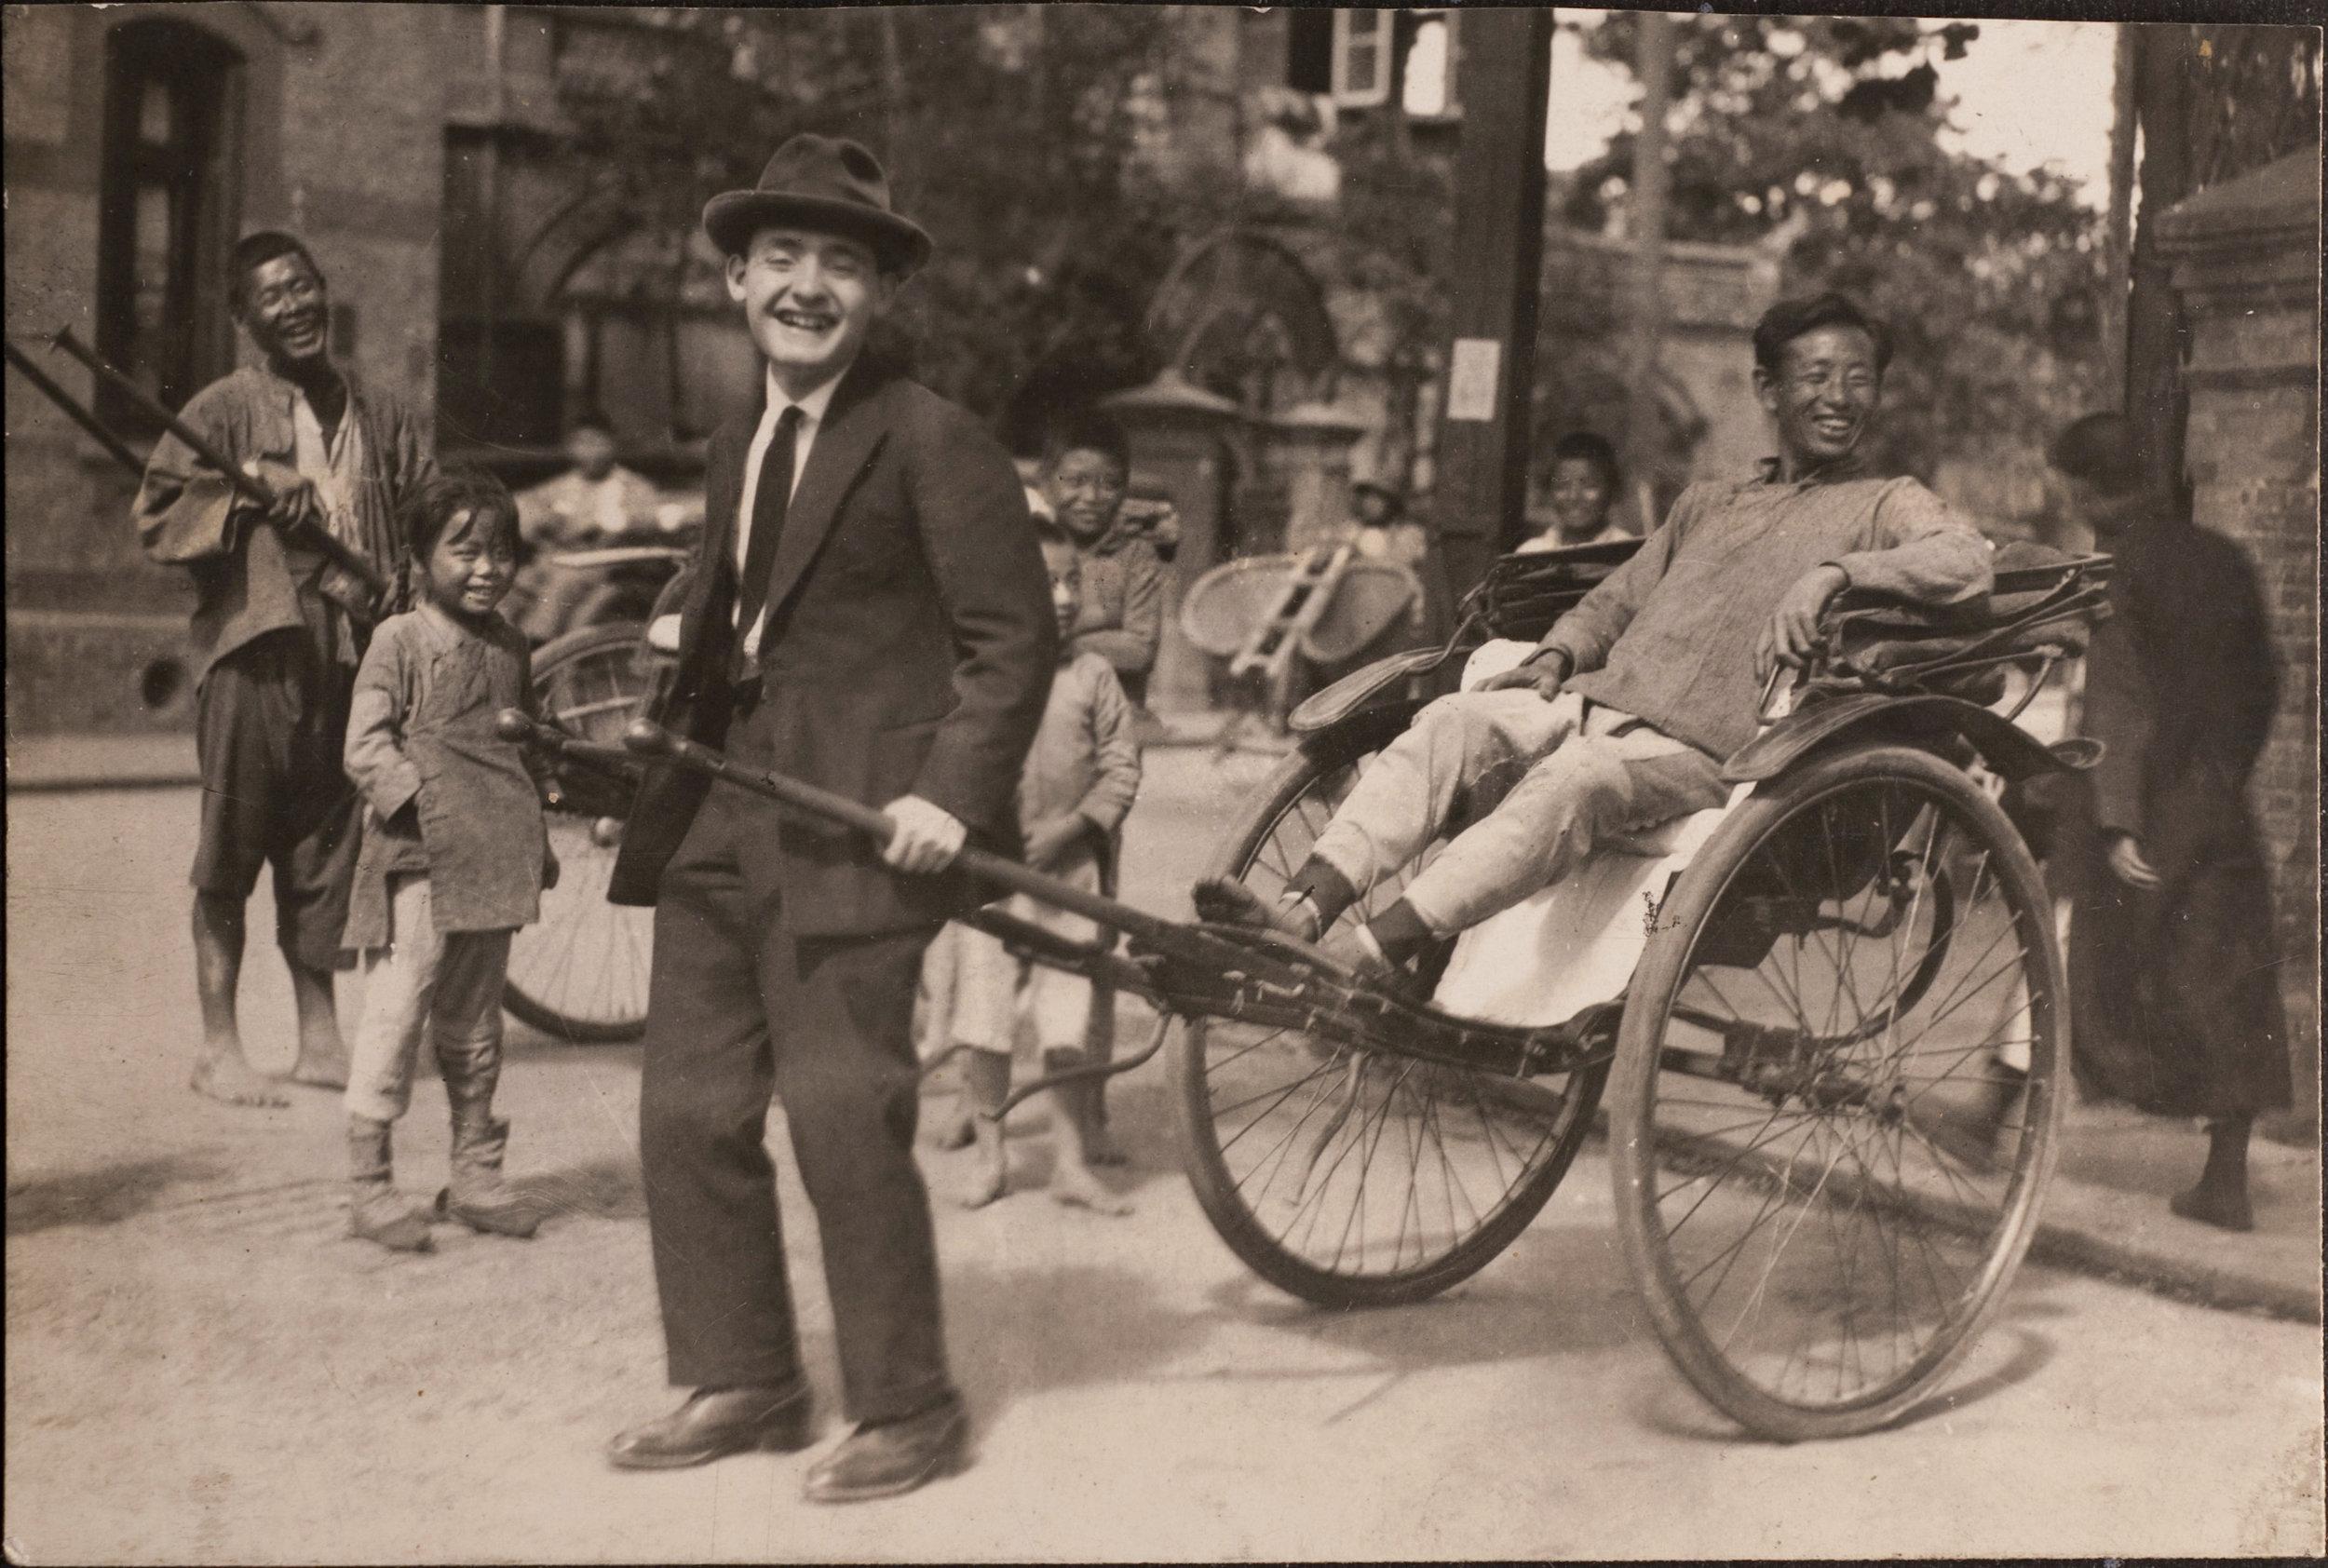 sam-sanzetti-shanghai-1930-1940-photography-of-china-147.jpg